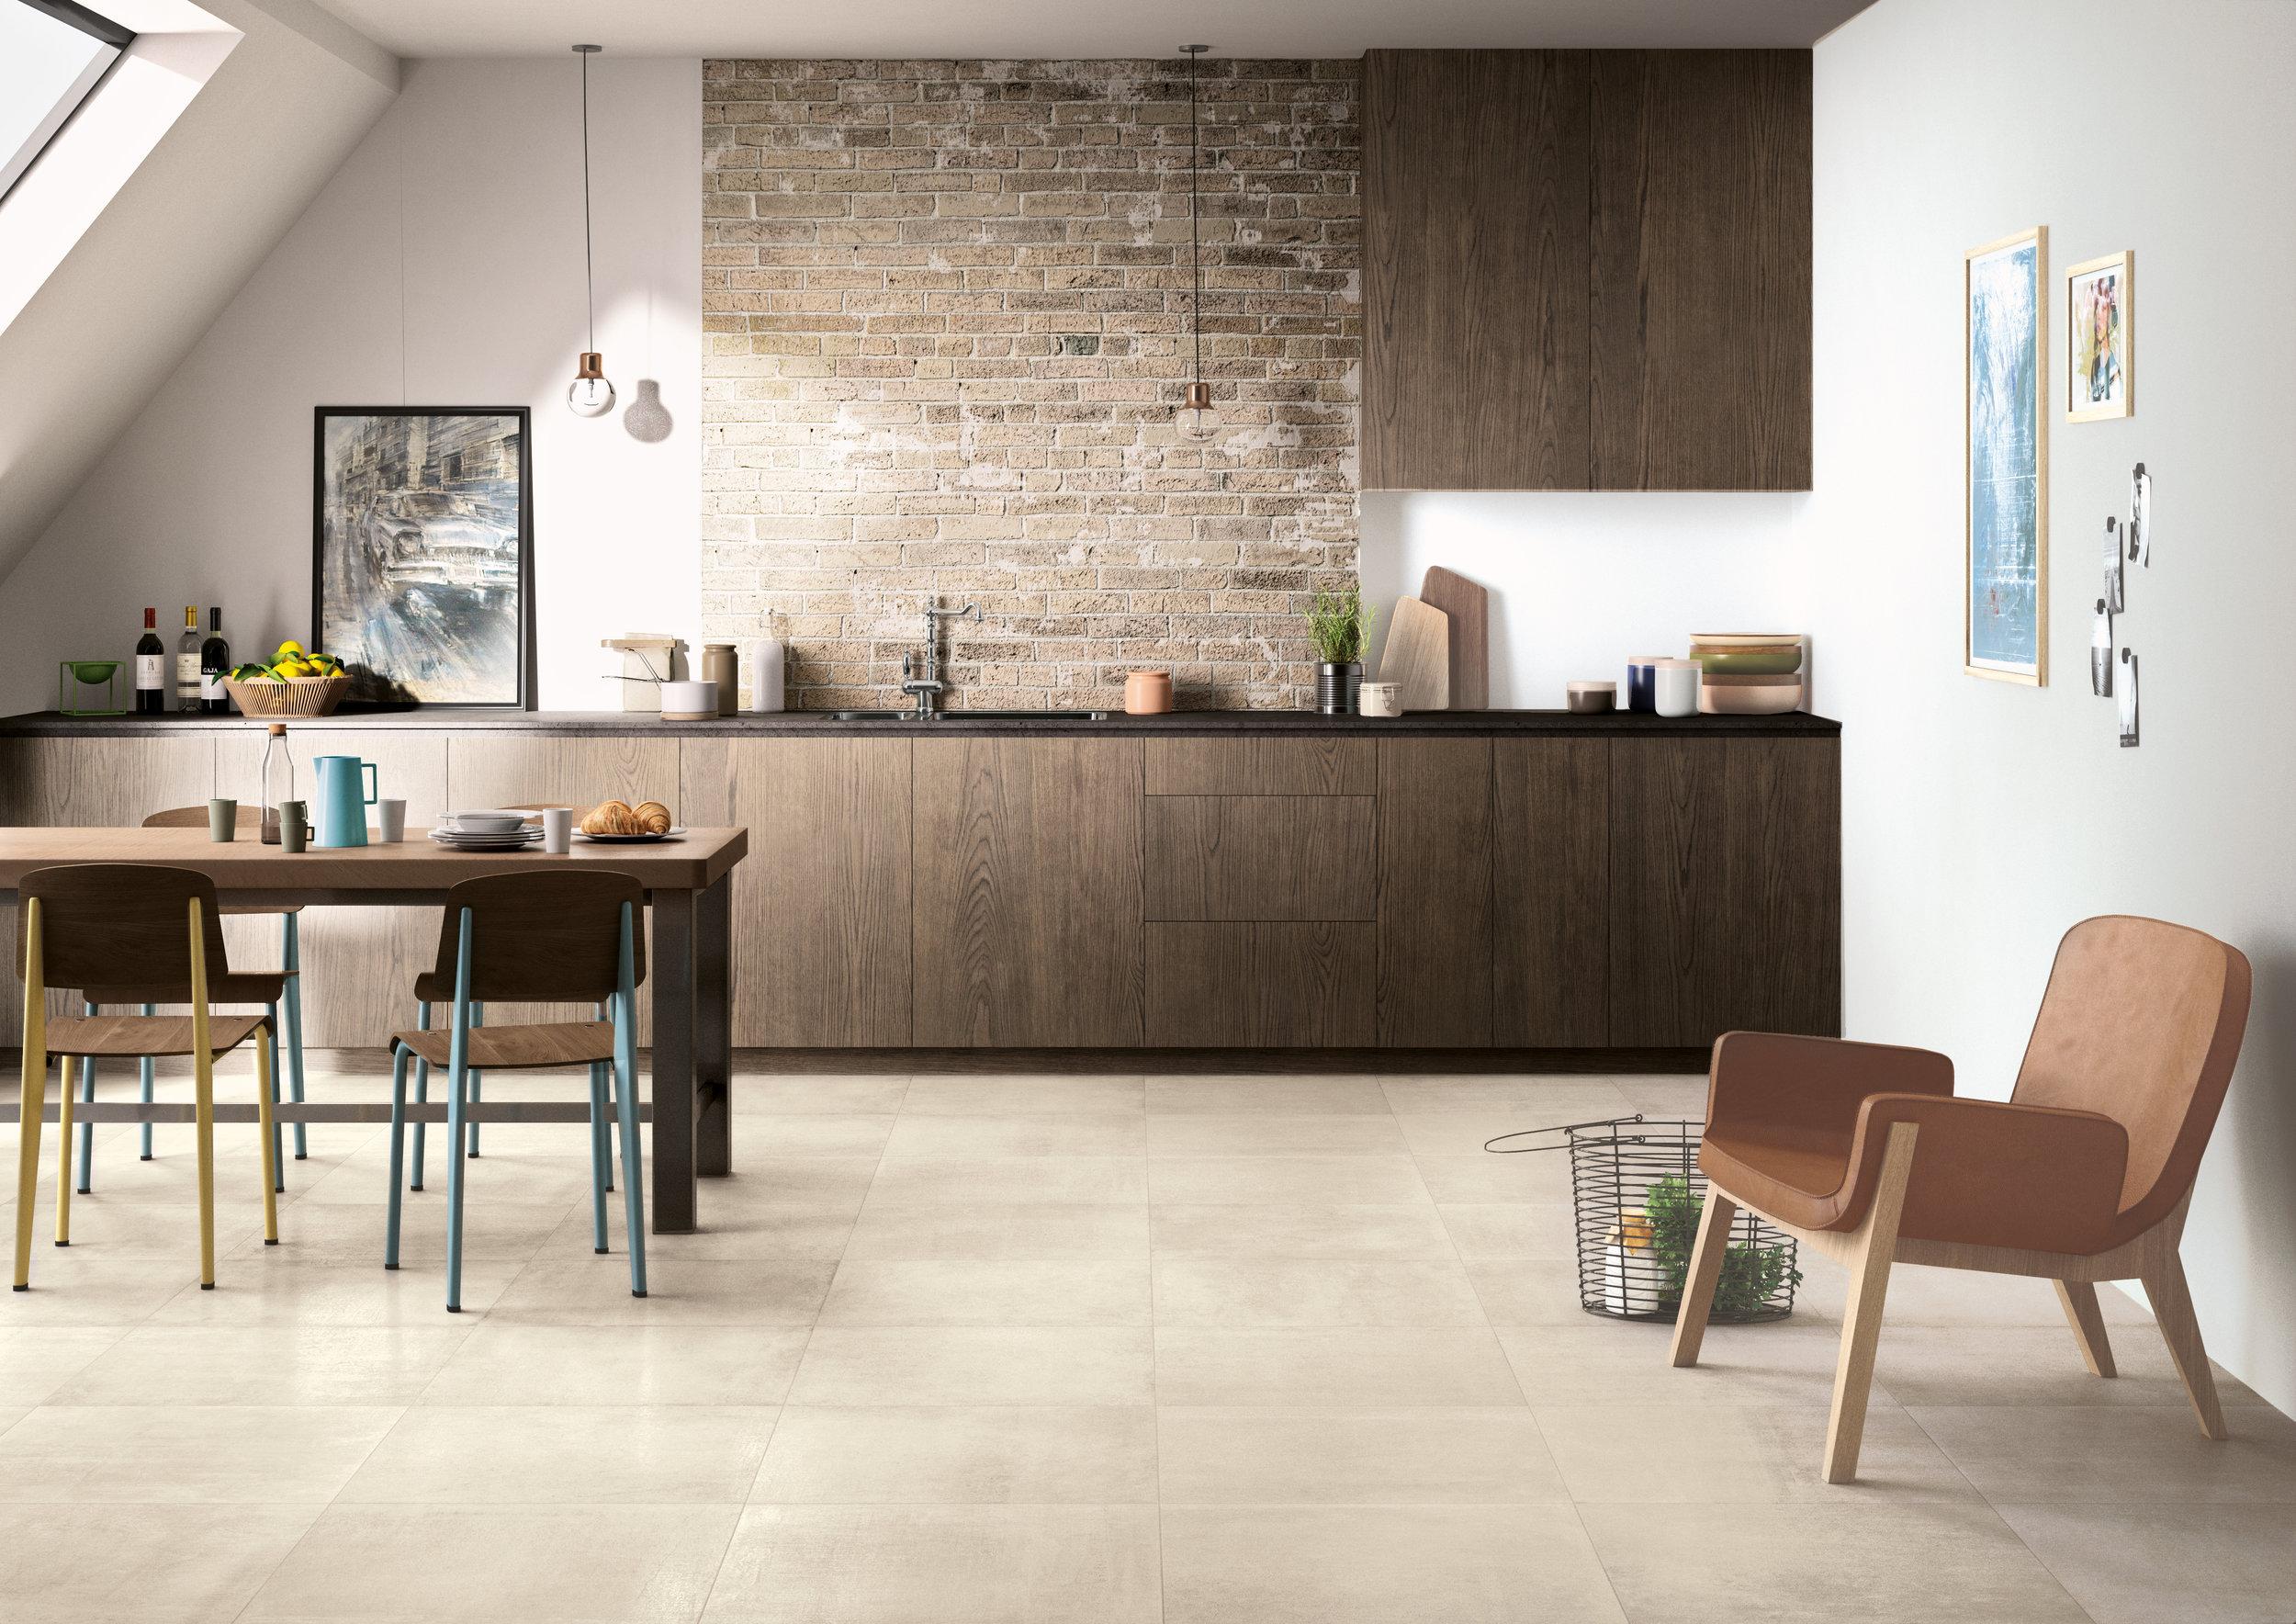 BLU-concretejungle-atelier25-honed-10mm-kitchen-001.jpg